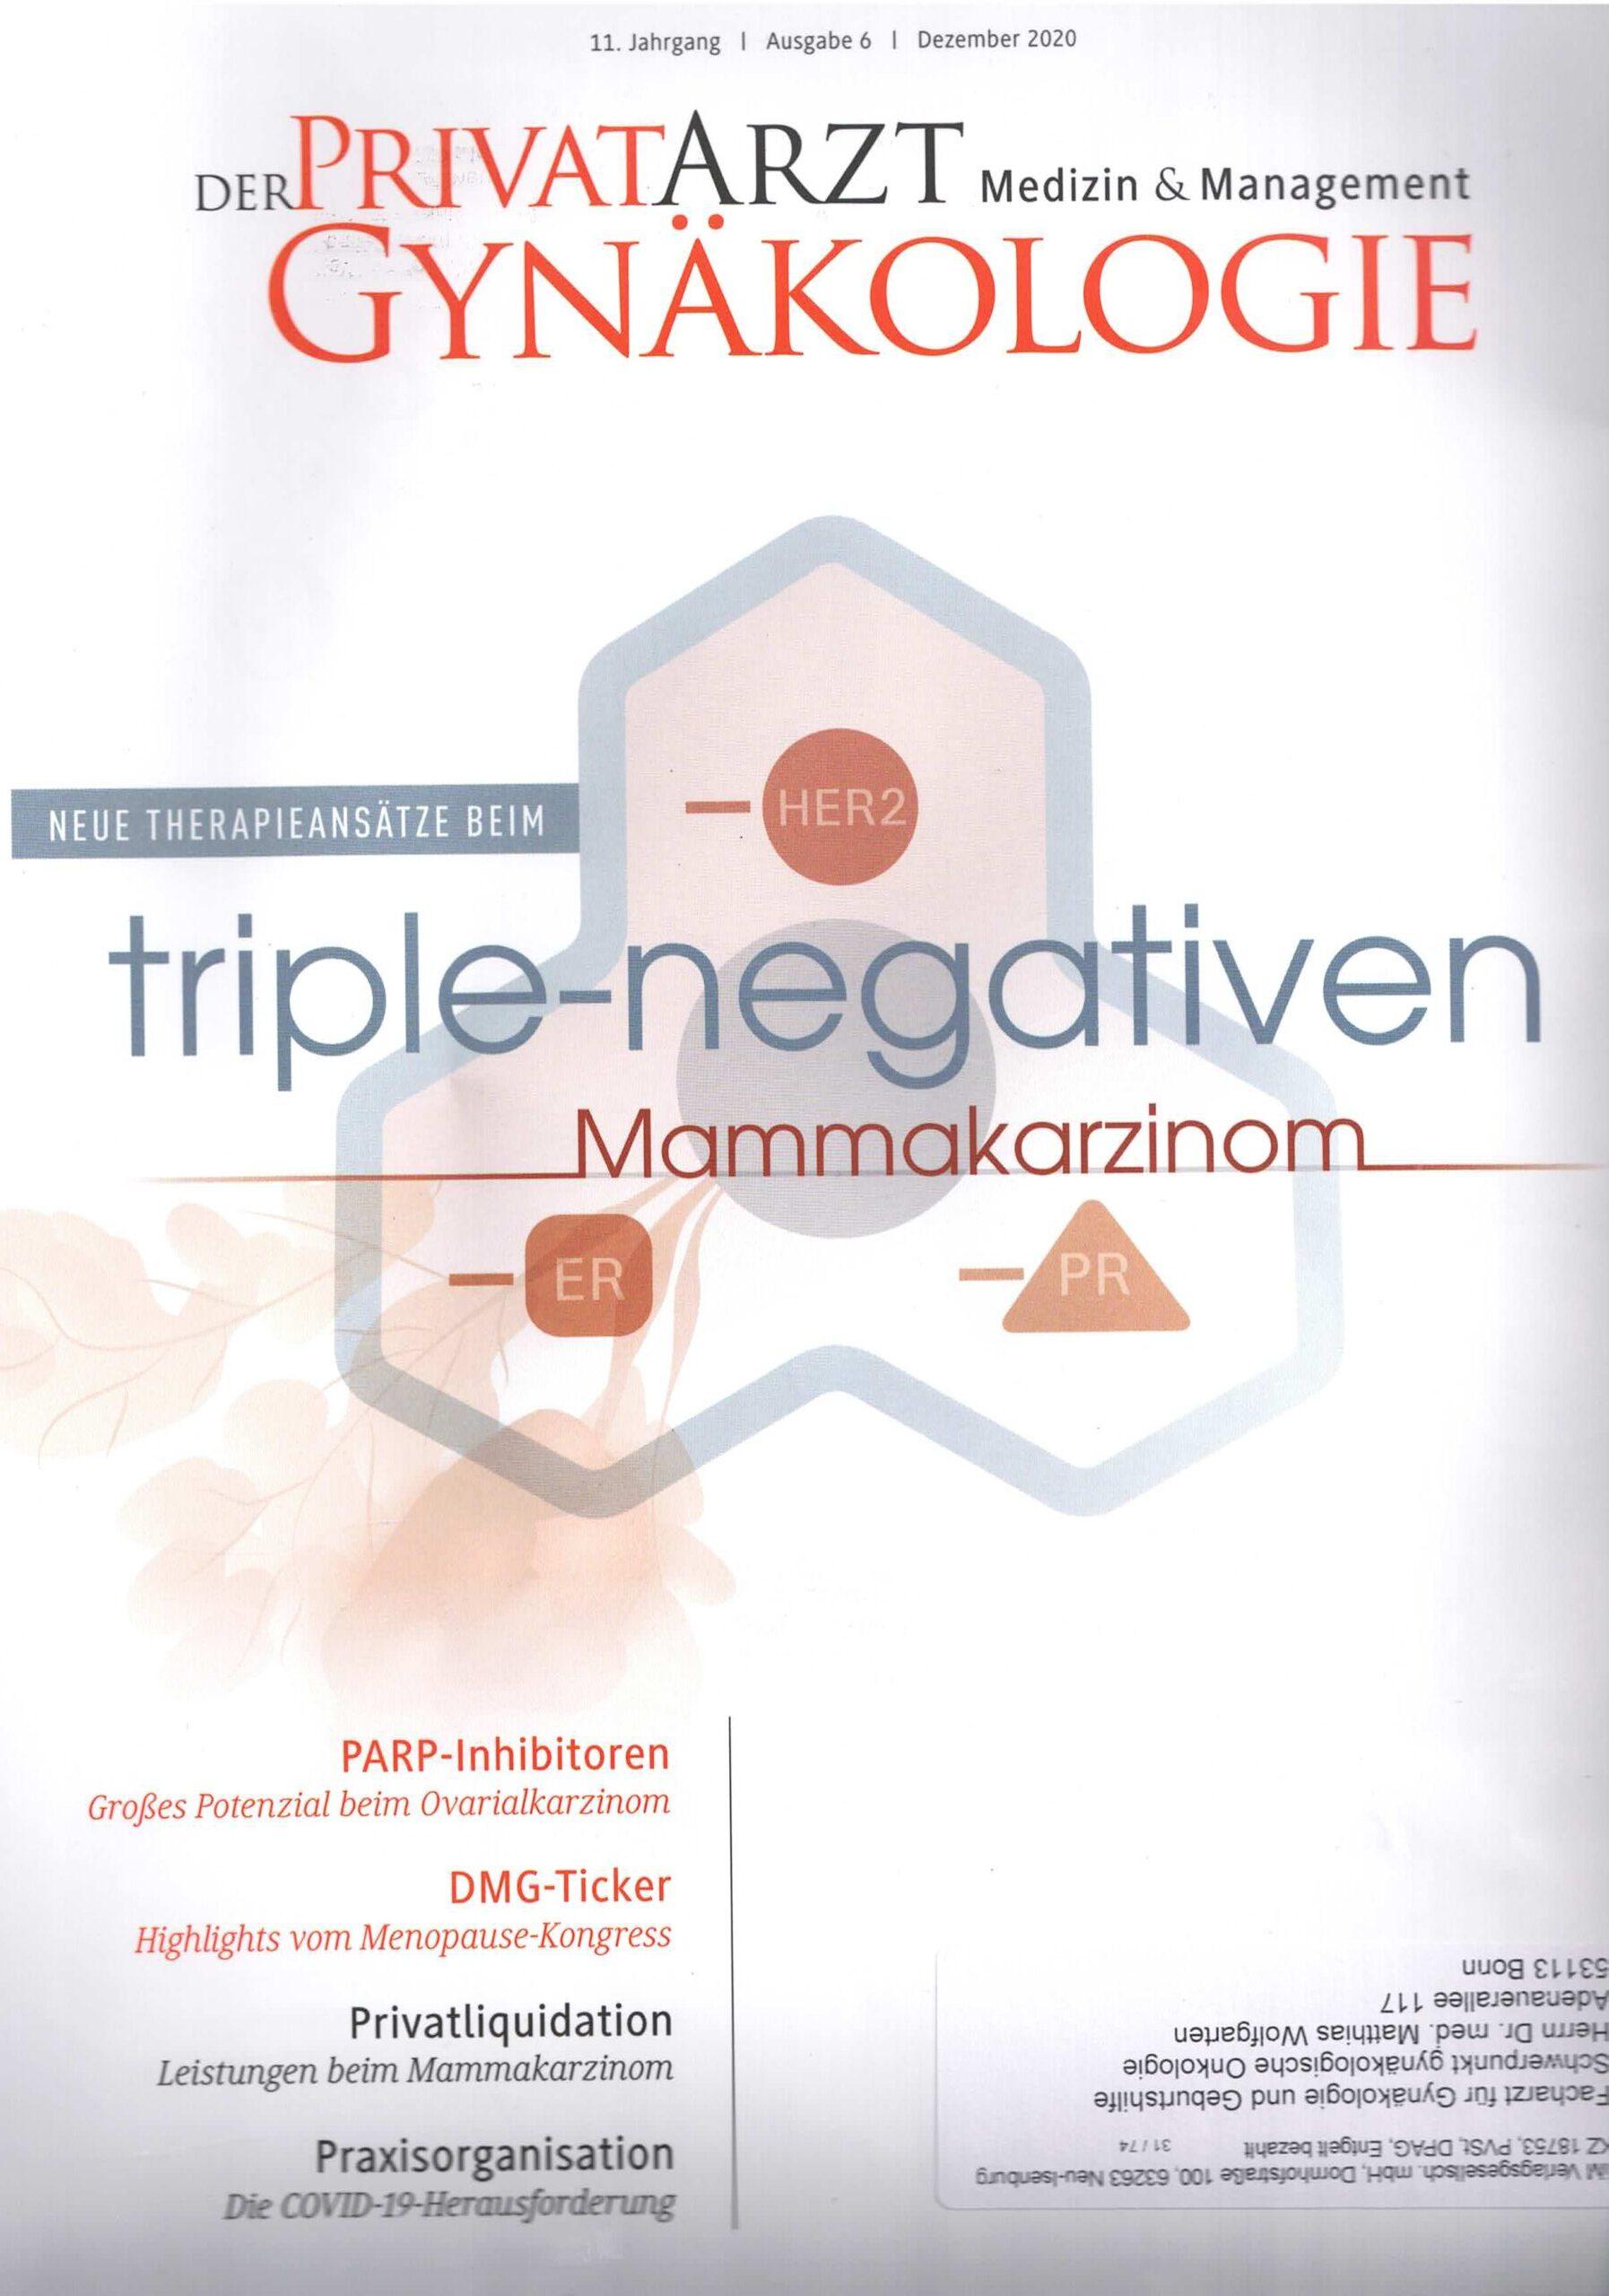 Der Privatarzt Gynäkologie Ausgabe 6 Dezember 2020 Deckblatt